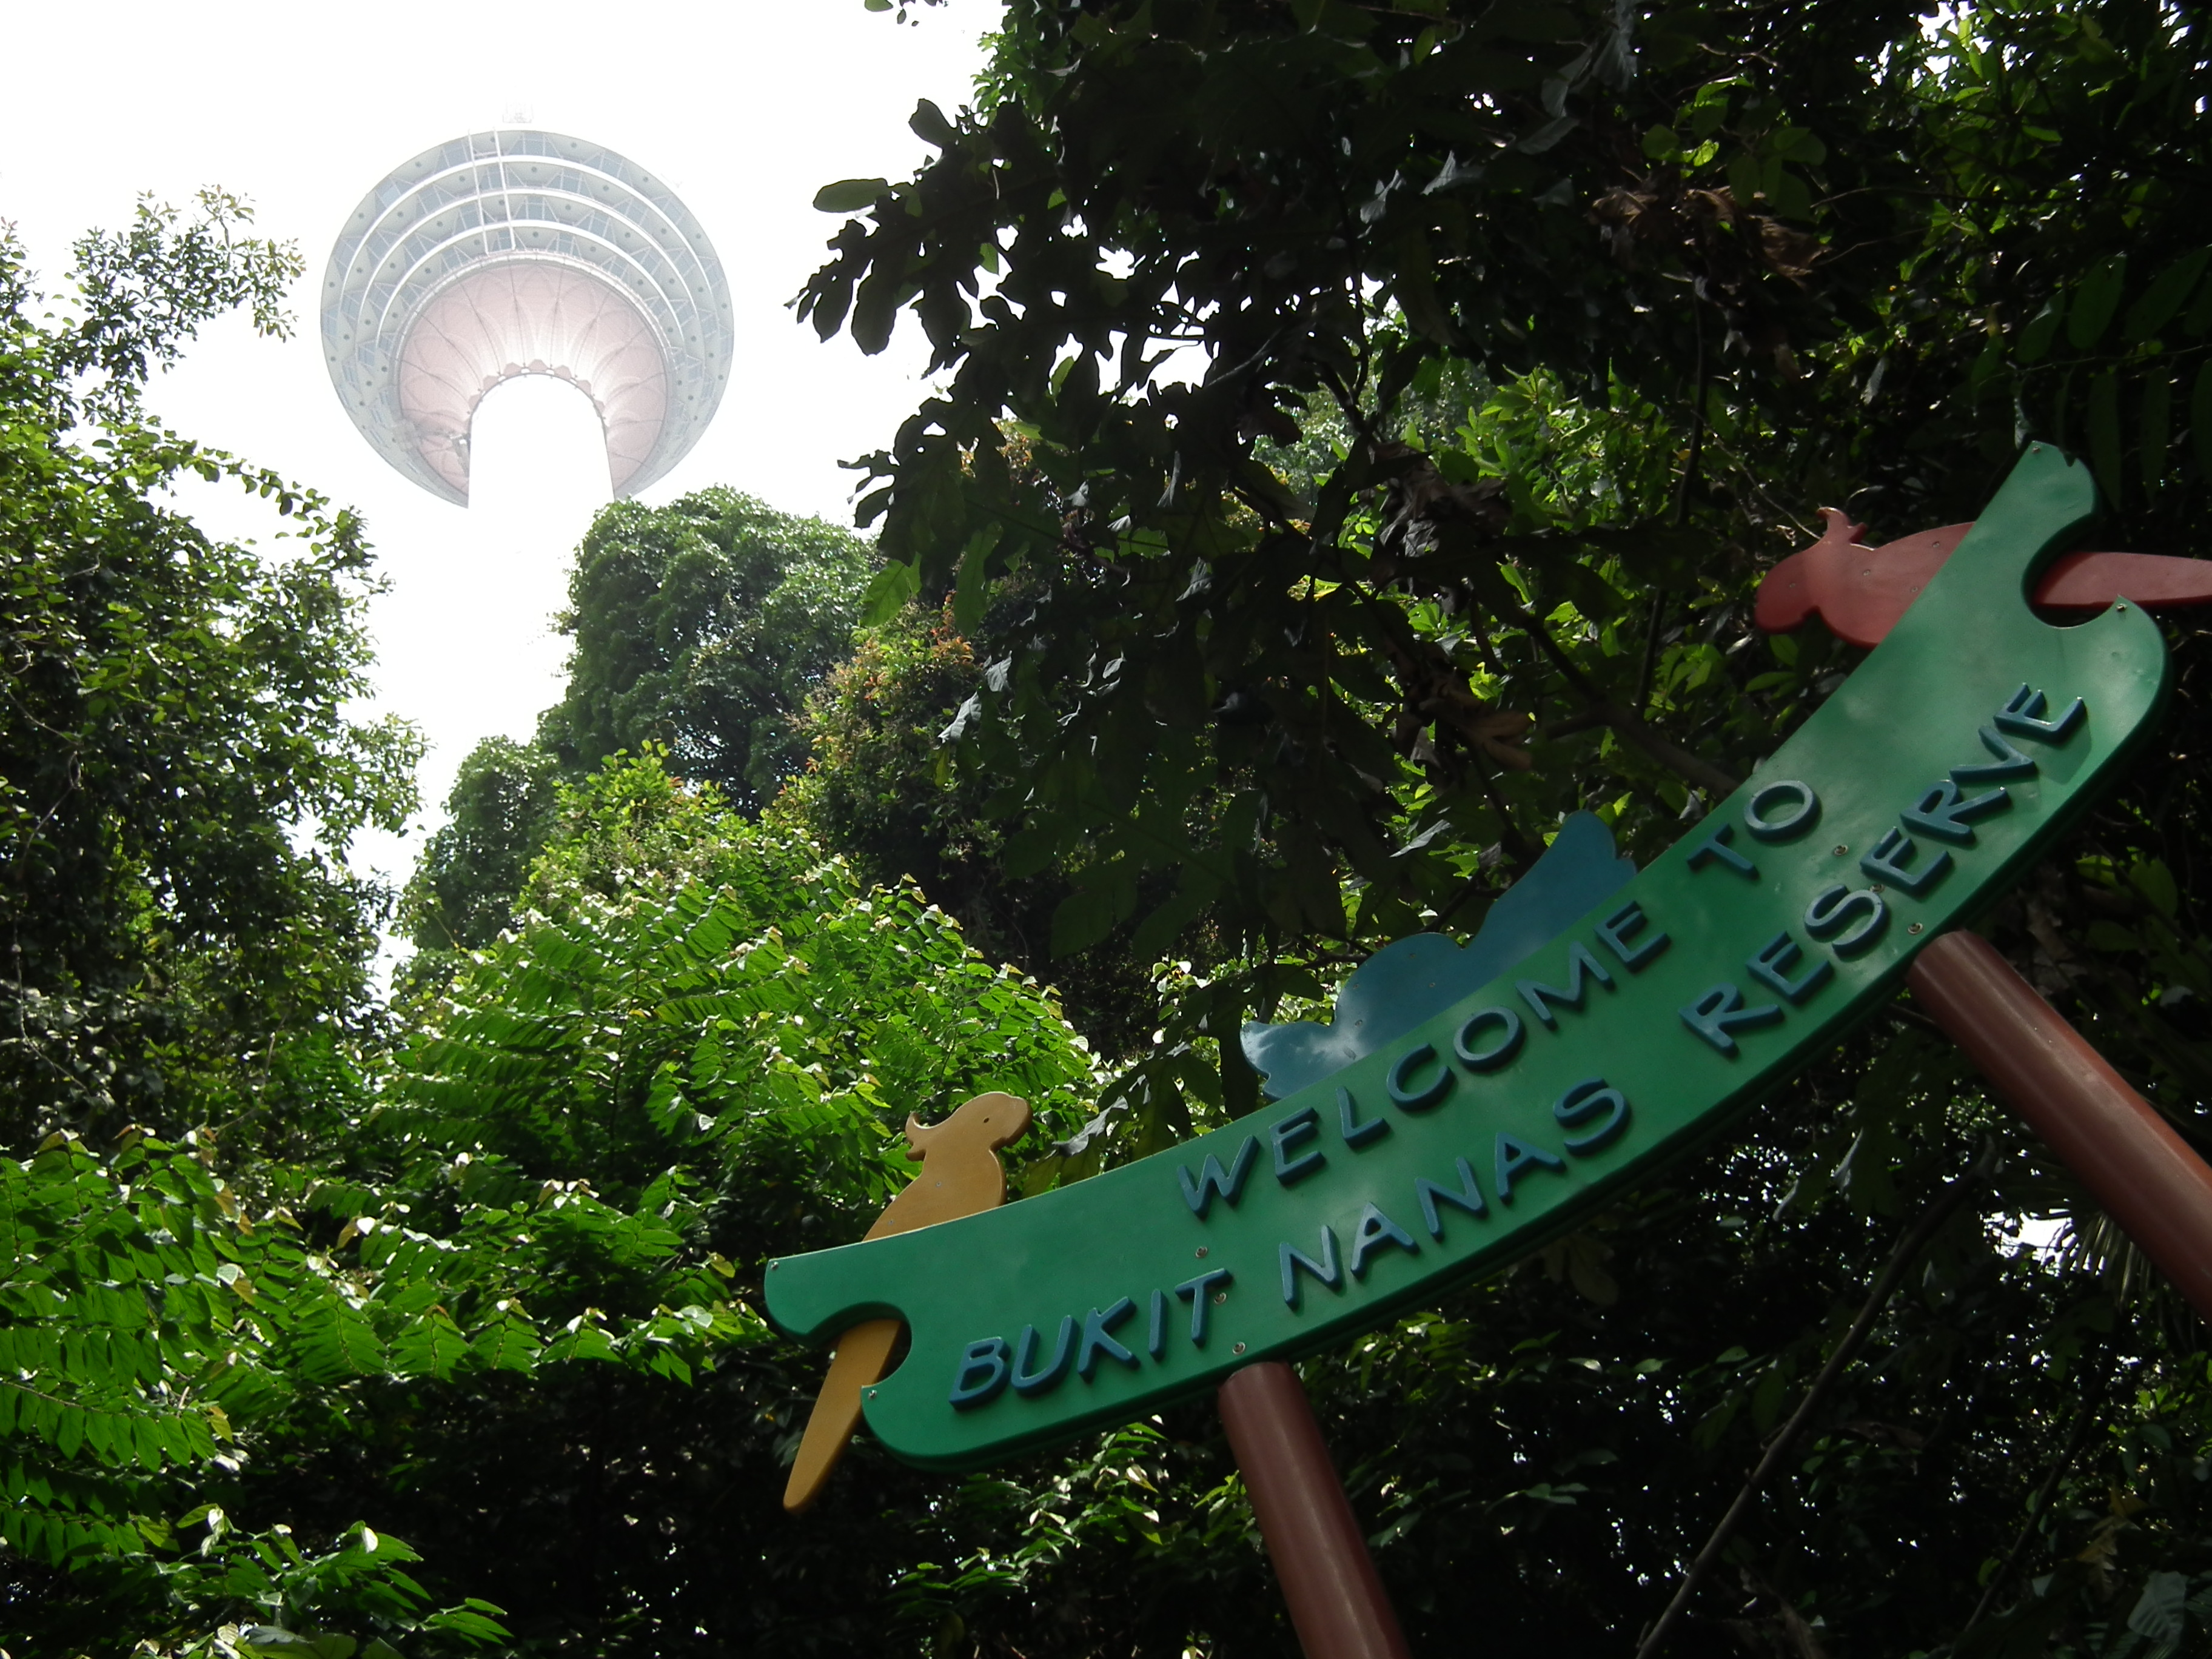 bukit-nanas-forest-reserve-1